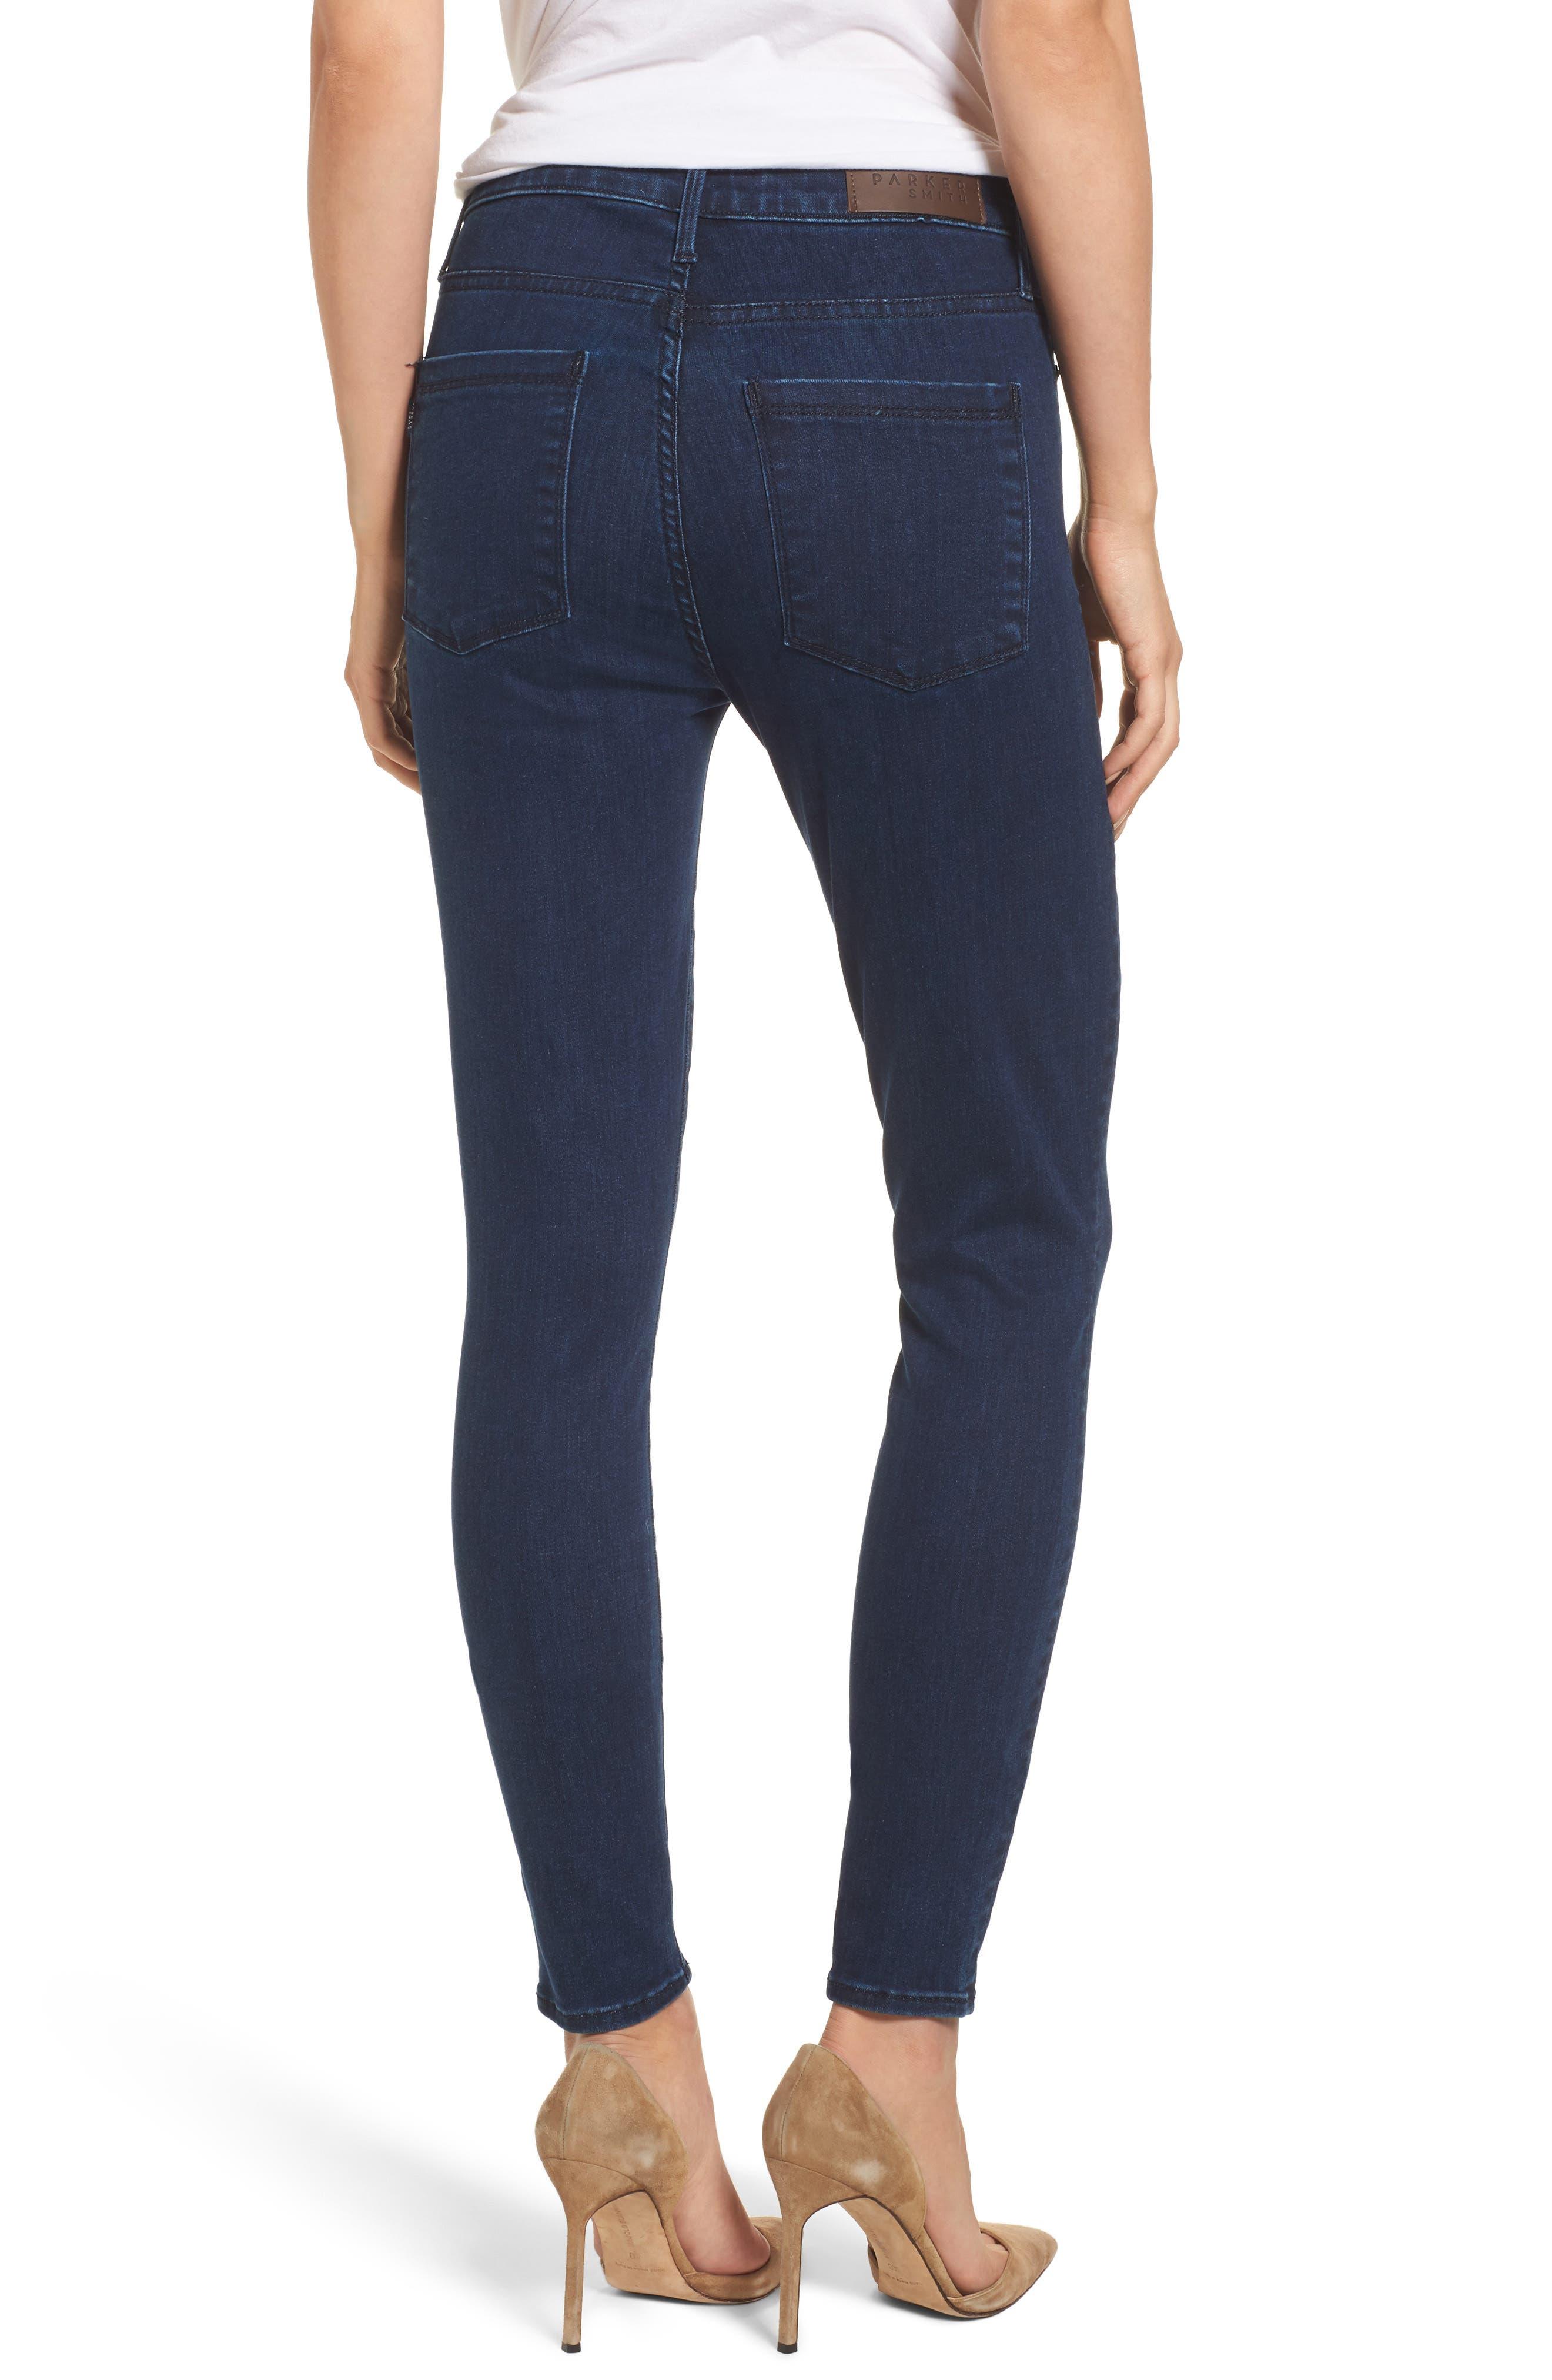 Alternate Image 2  - Parker Smith Bombshell High Waist Skinny Jeans (Sky Line)